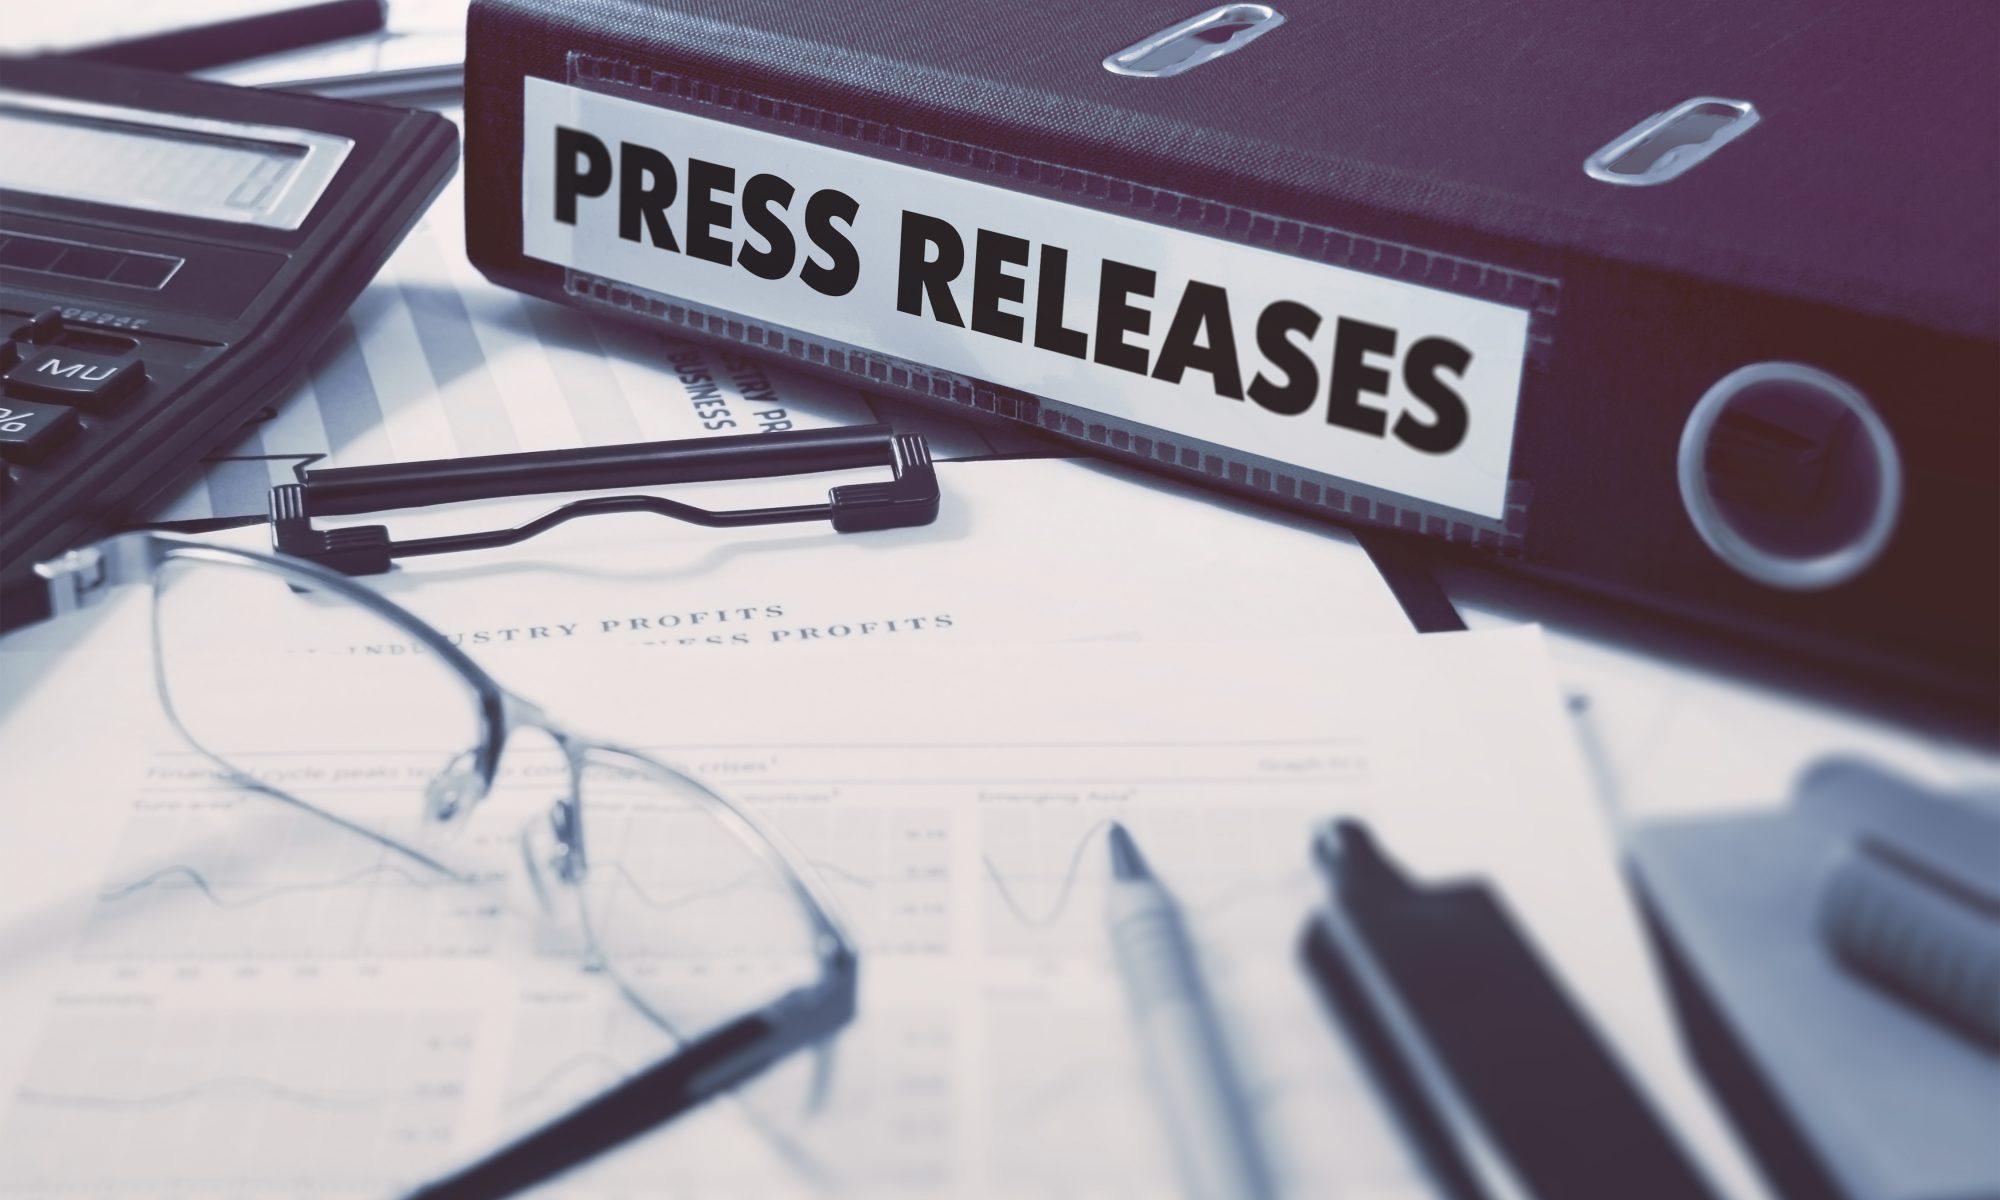 press release distribution, press release